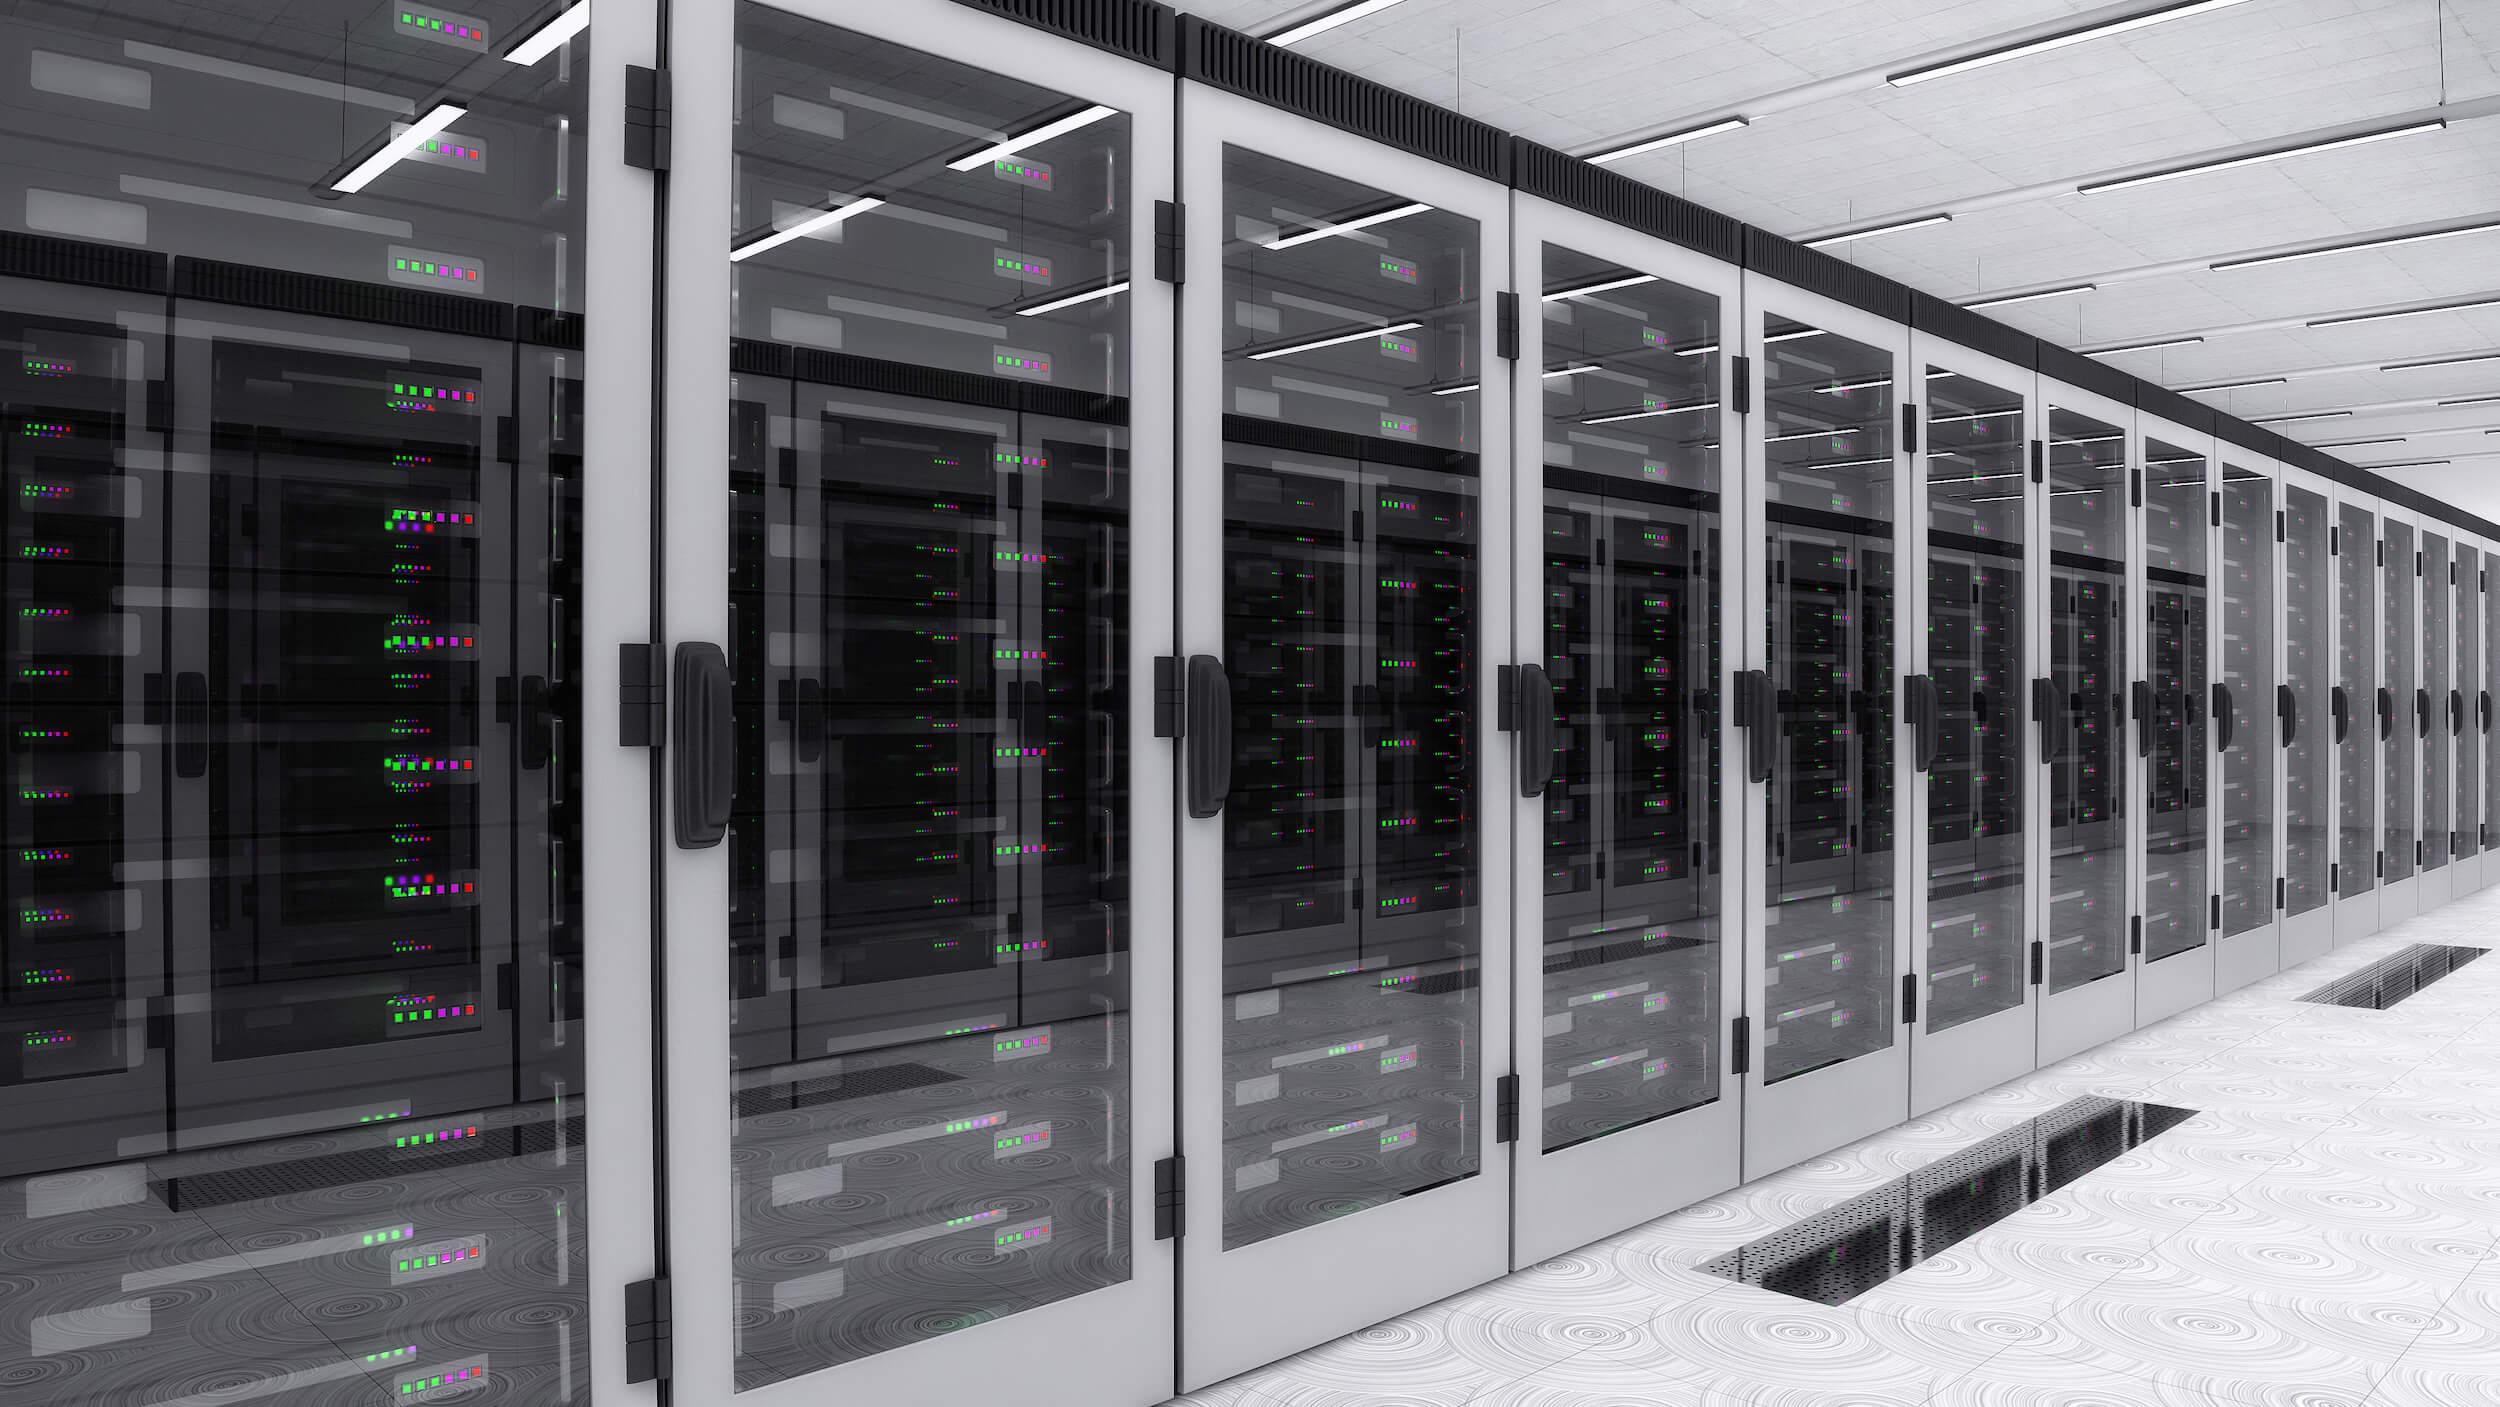 Network Server, Server Room, Big Data, Backup, Data Mining